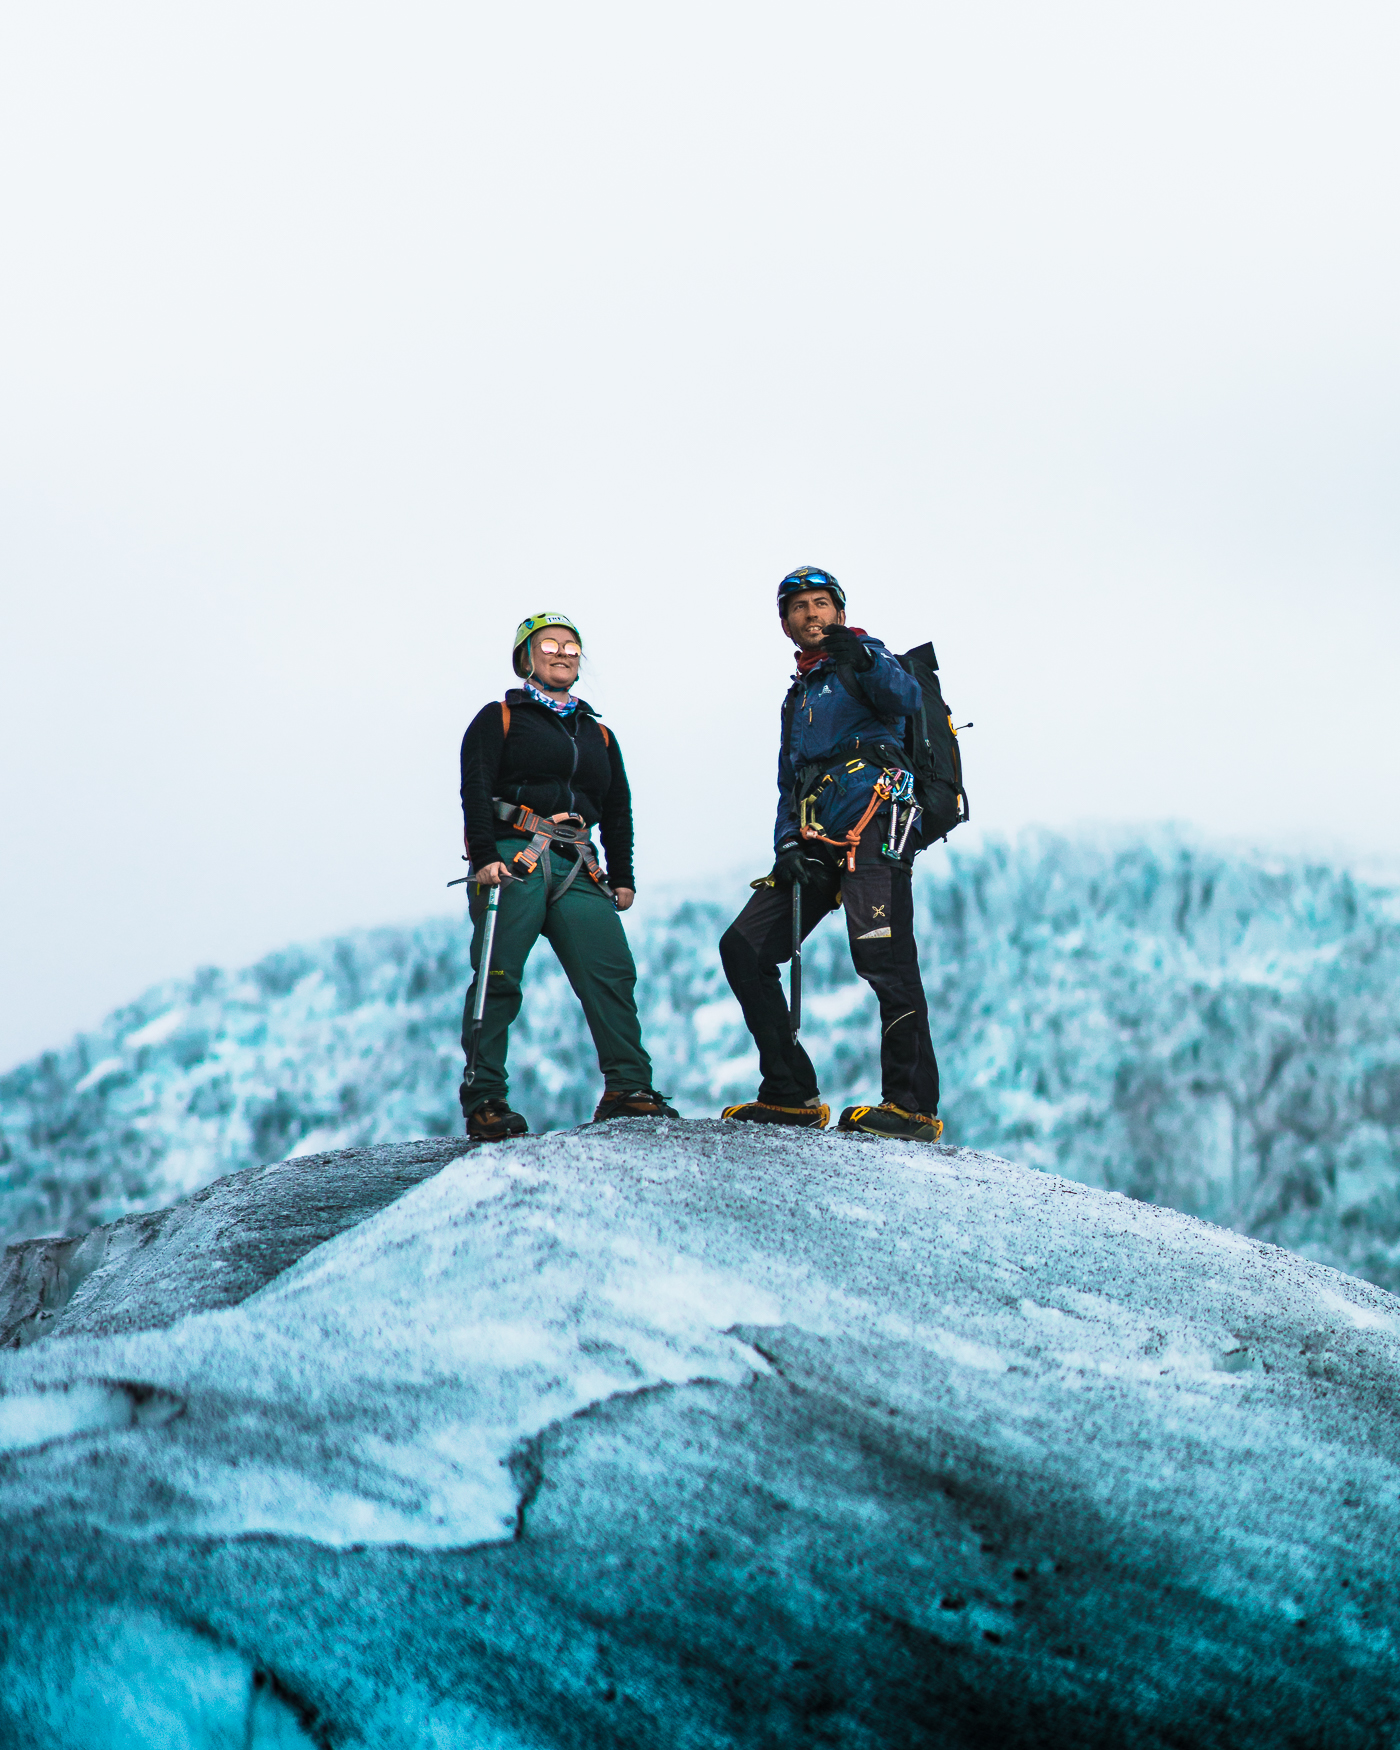 gabornagy_photography_iceland_glacier10.jpg